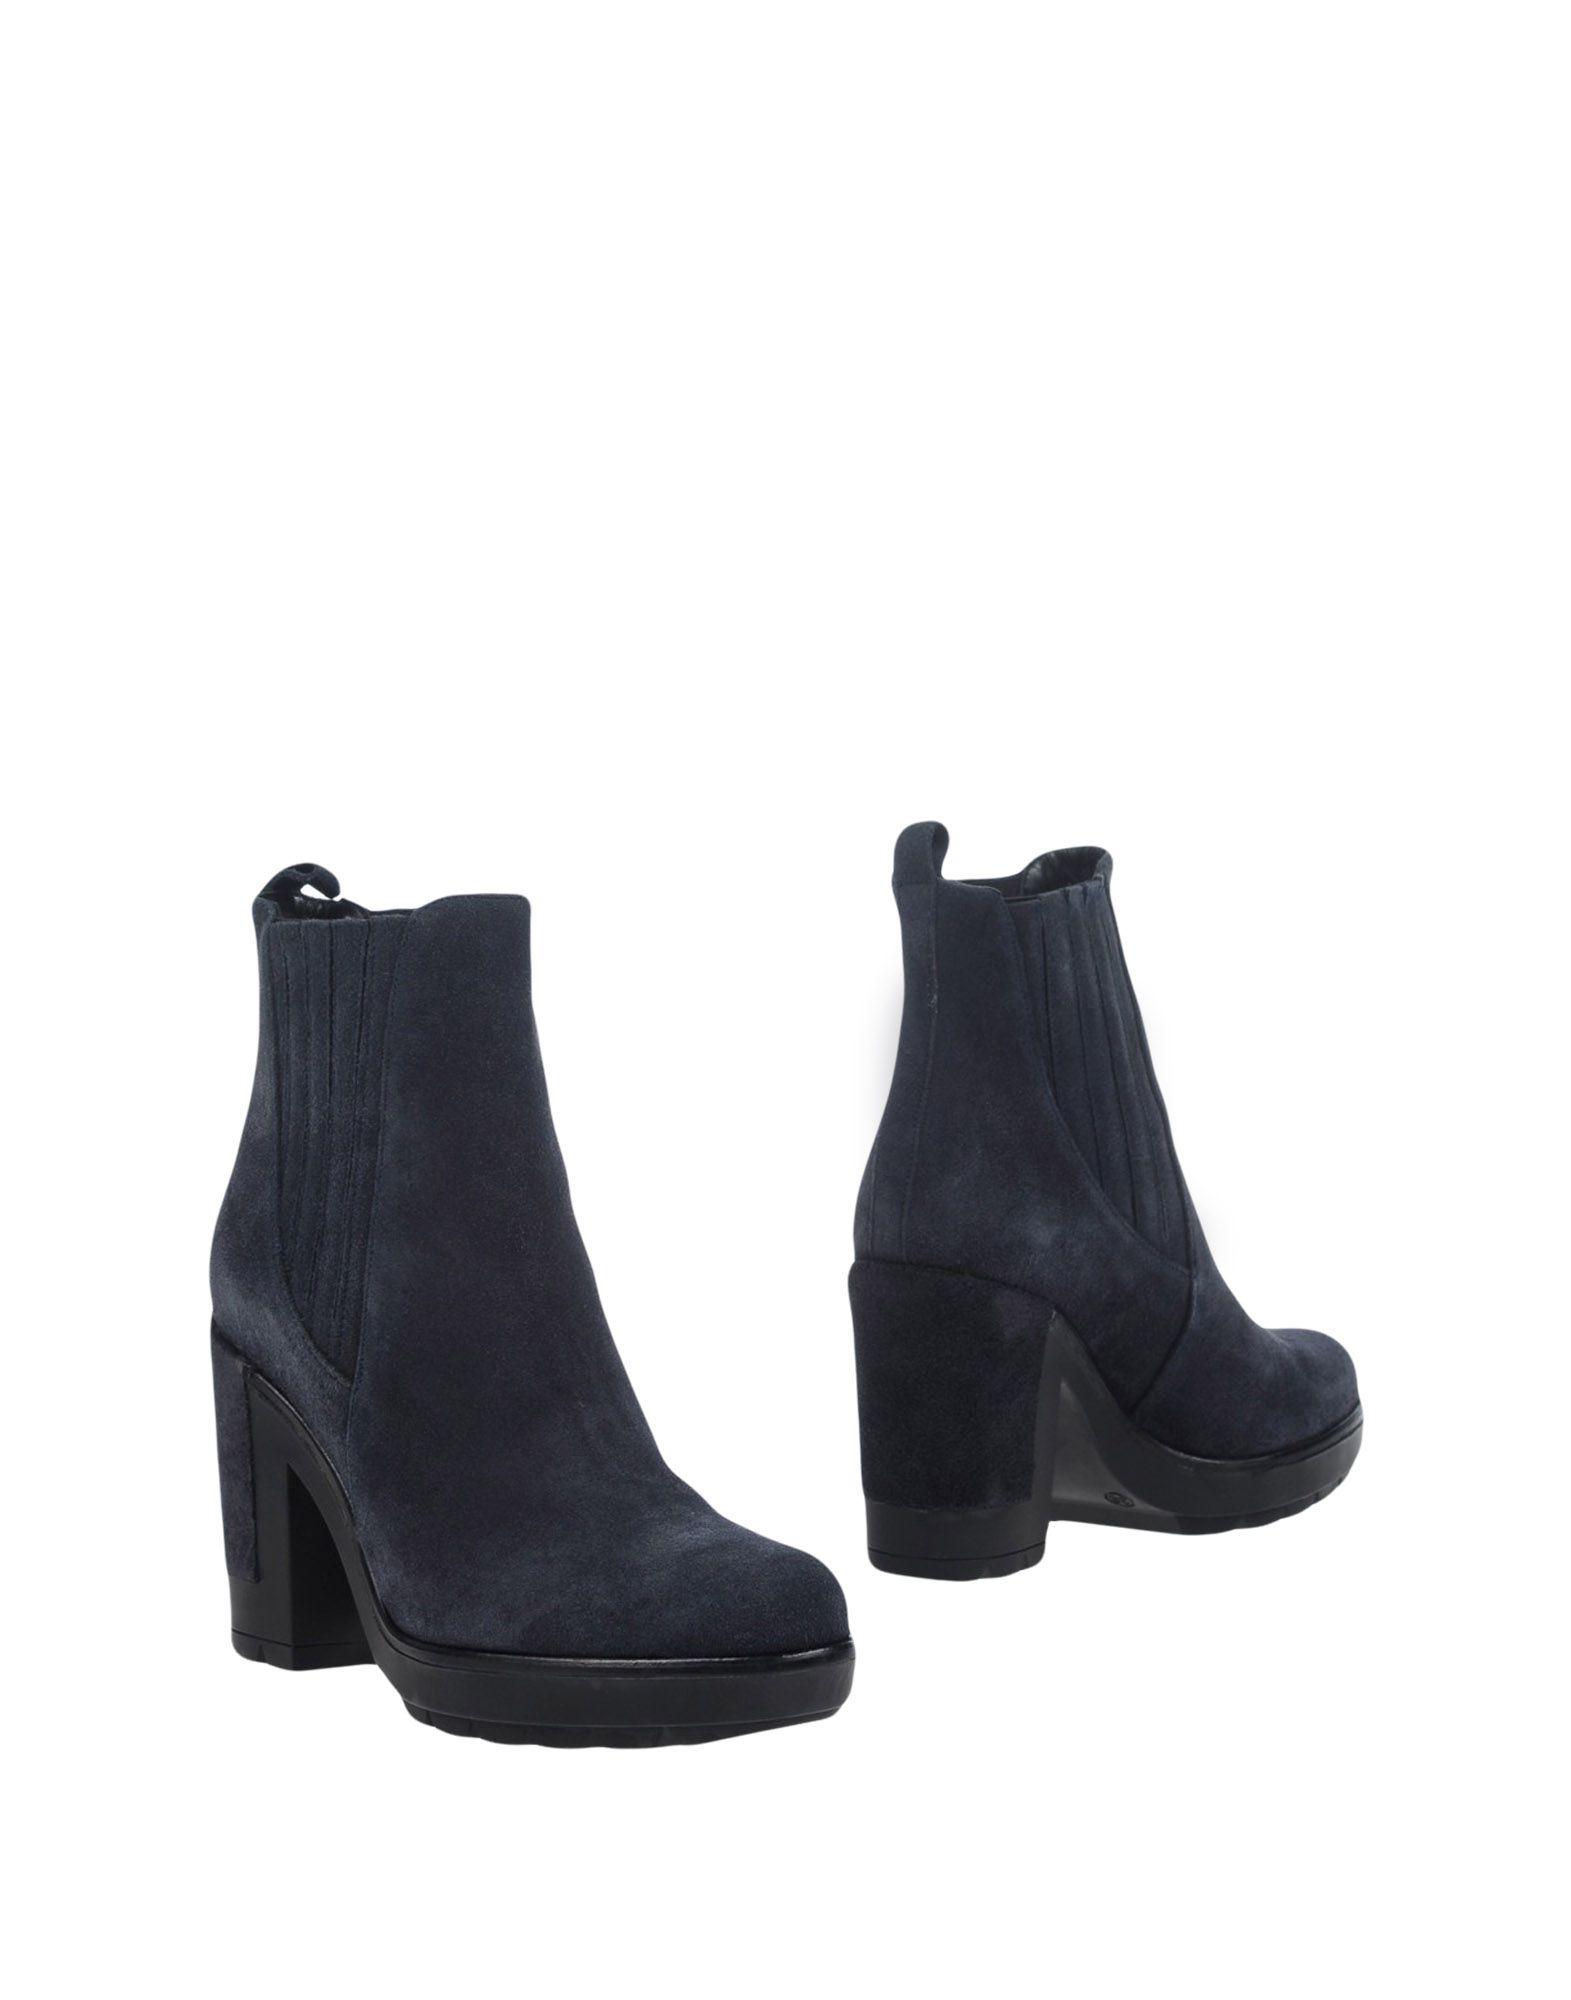 GAIA BARDELLI Полусапоги и высокие ботинки цены онлайн